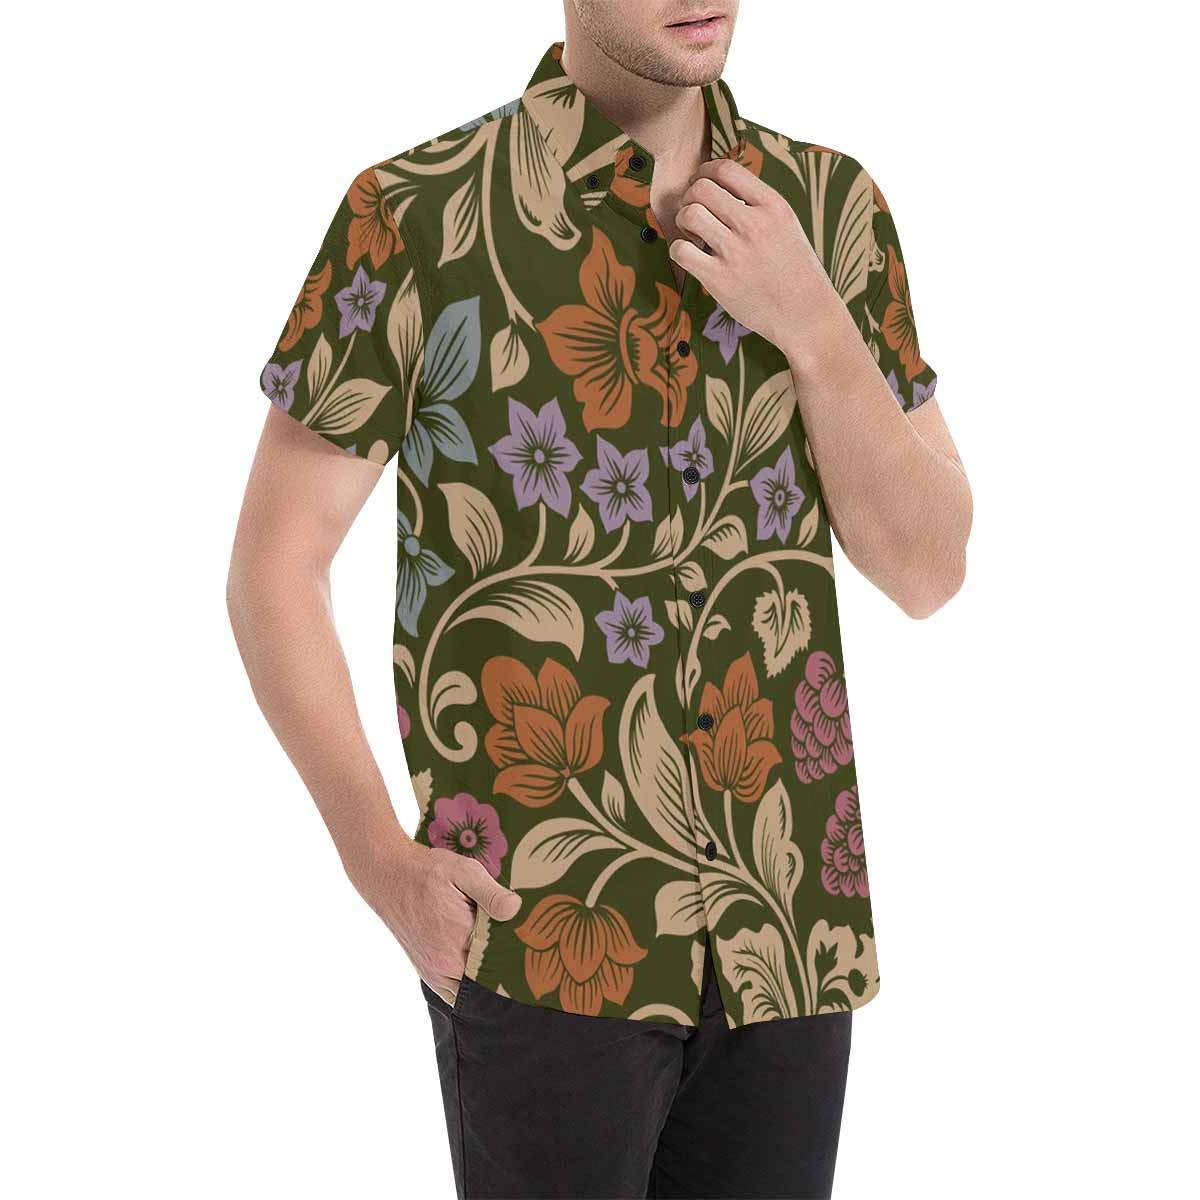 InterestPrint Mens Botton Up Flowers and Berries Short Sleeve Shirts